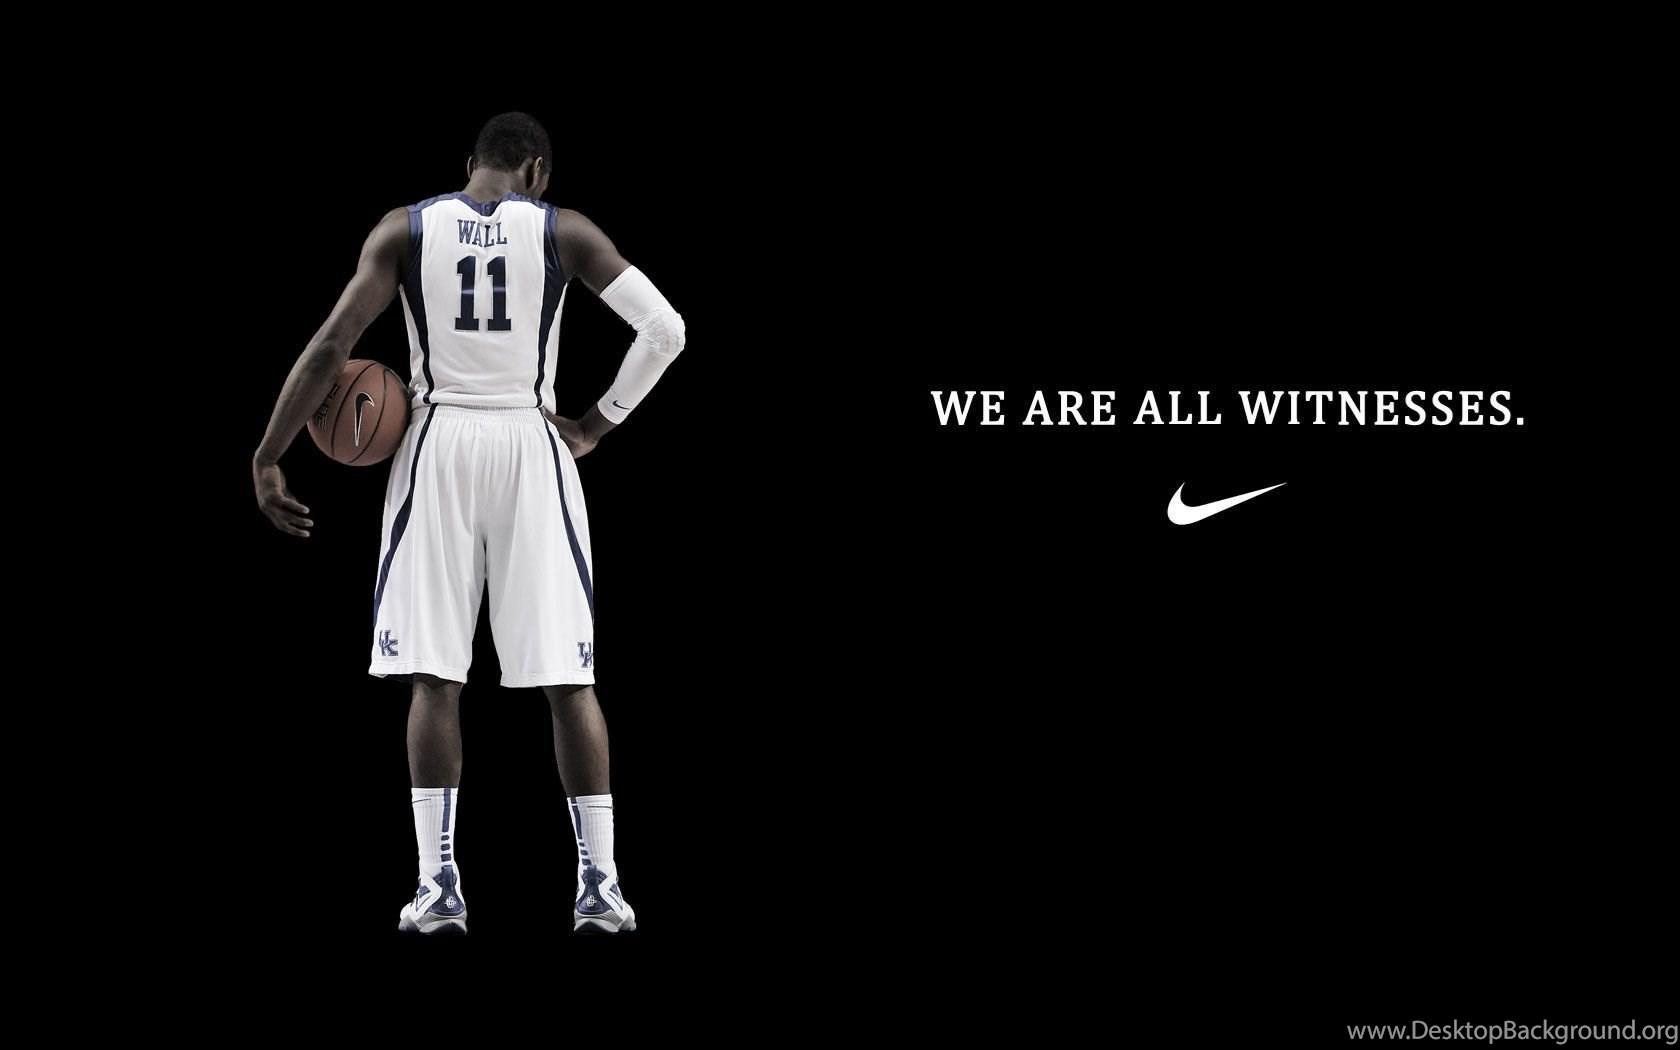 Nike Basketball Wallpaper Iphone X Larmoric Com